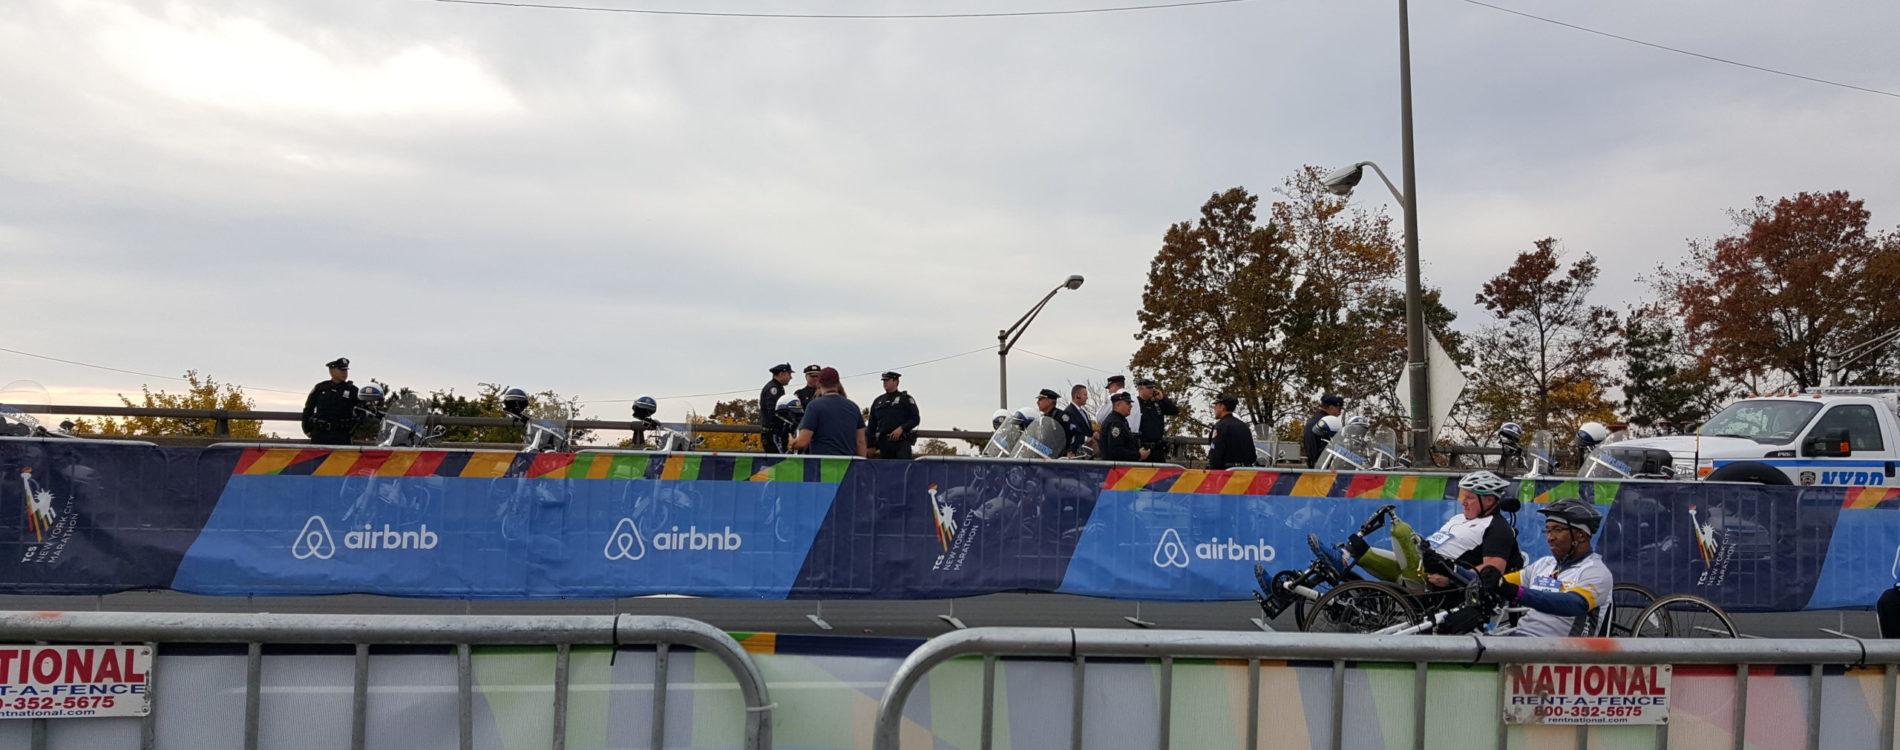 NYC Marathon_2015-11-01 08.54.18